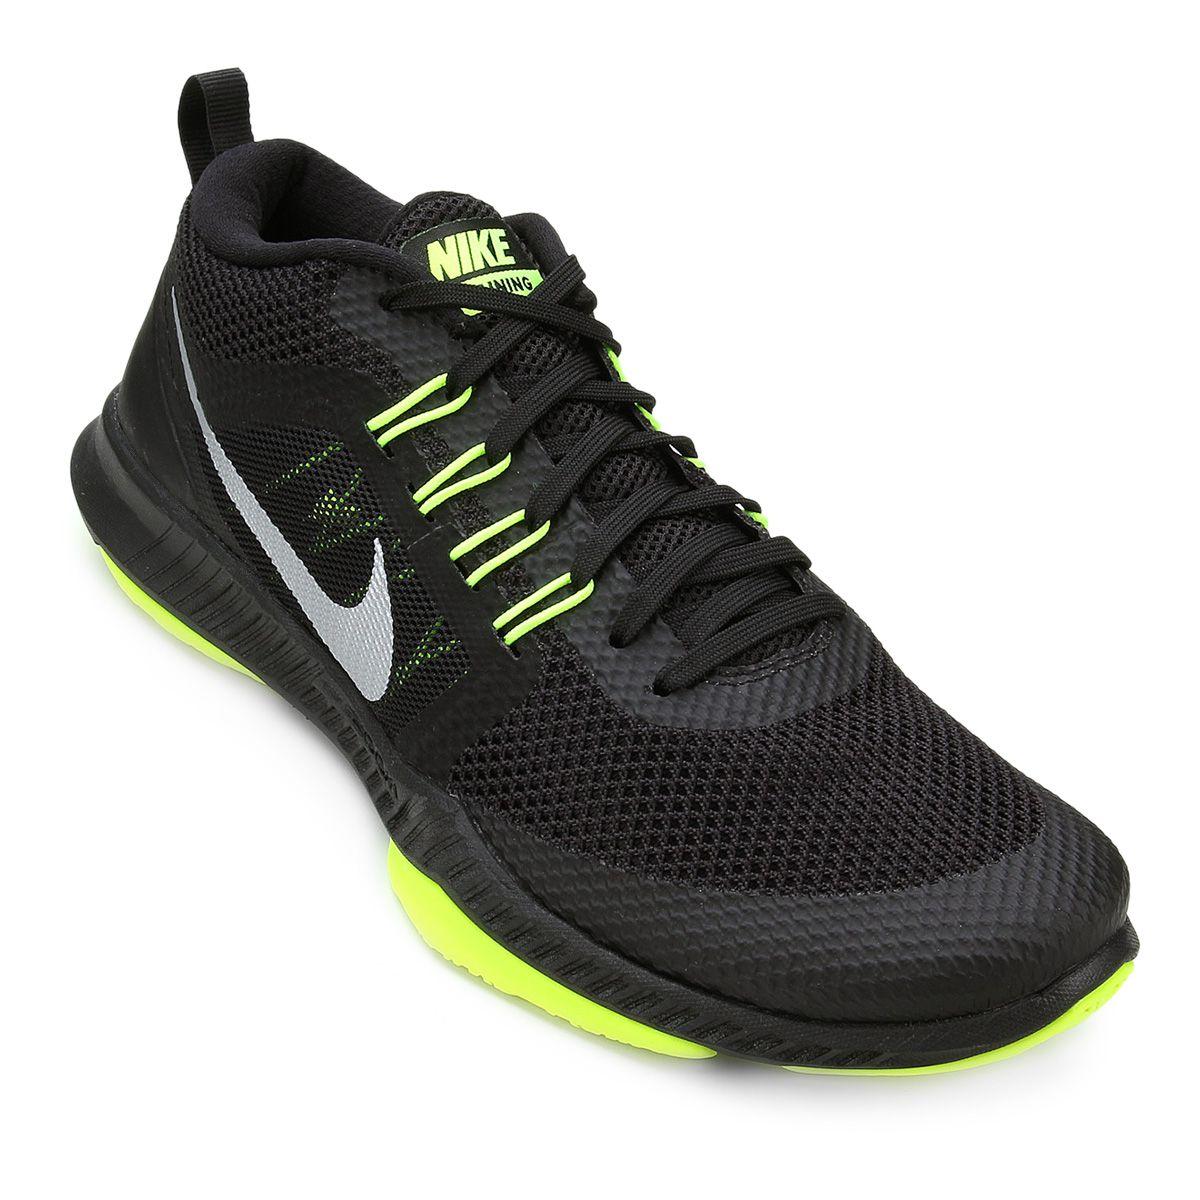 cf1aaf6db13 Tênis Masculino Nike Zoom Domination Tr - BRACIA SHOP  Loja de ...